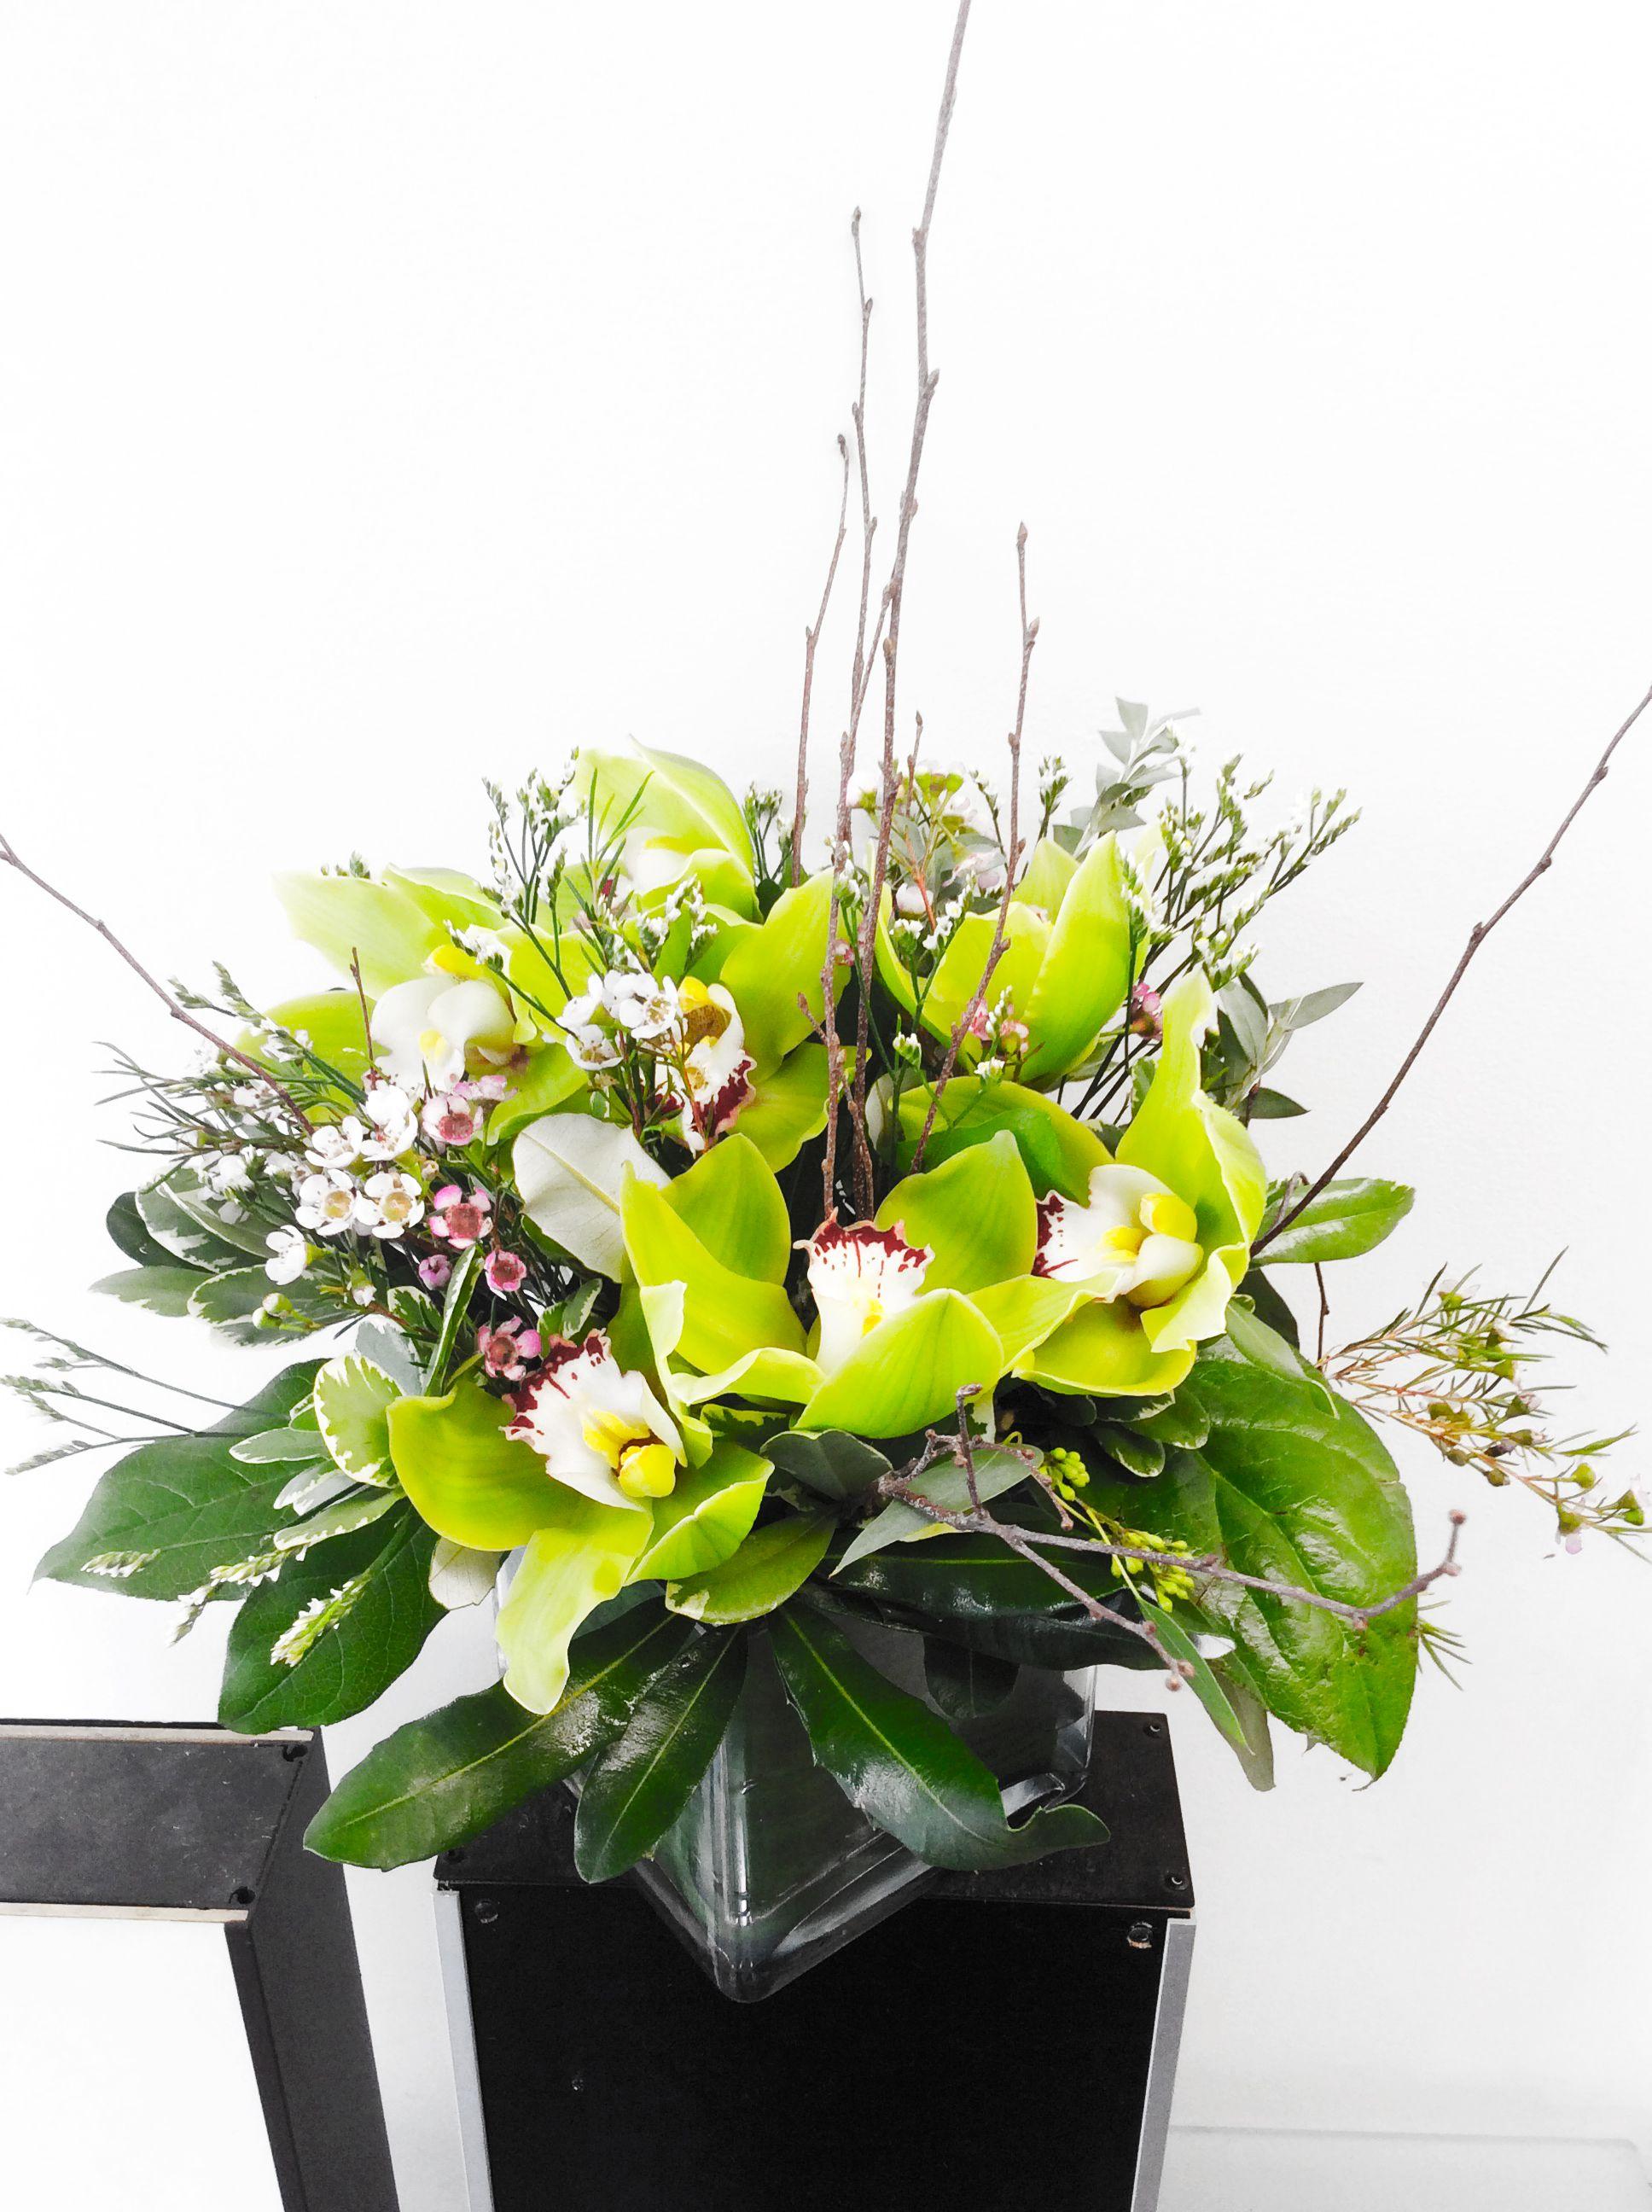 A Custom Floral Arrangement In A Square Vase Designed By